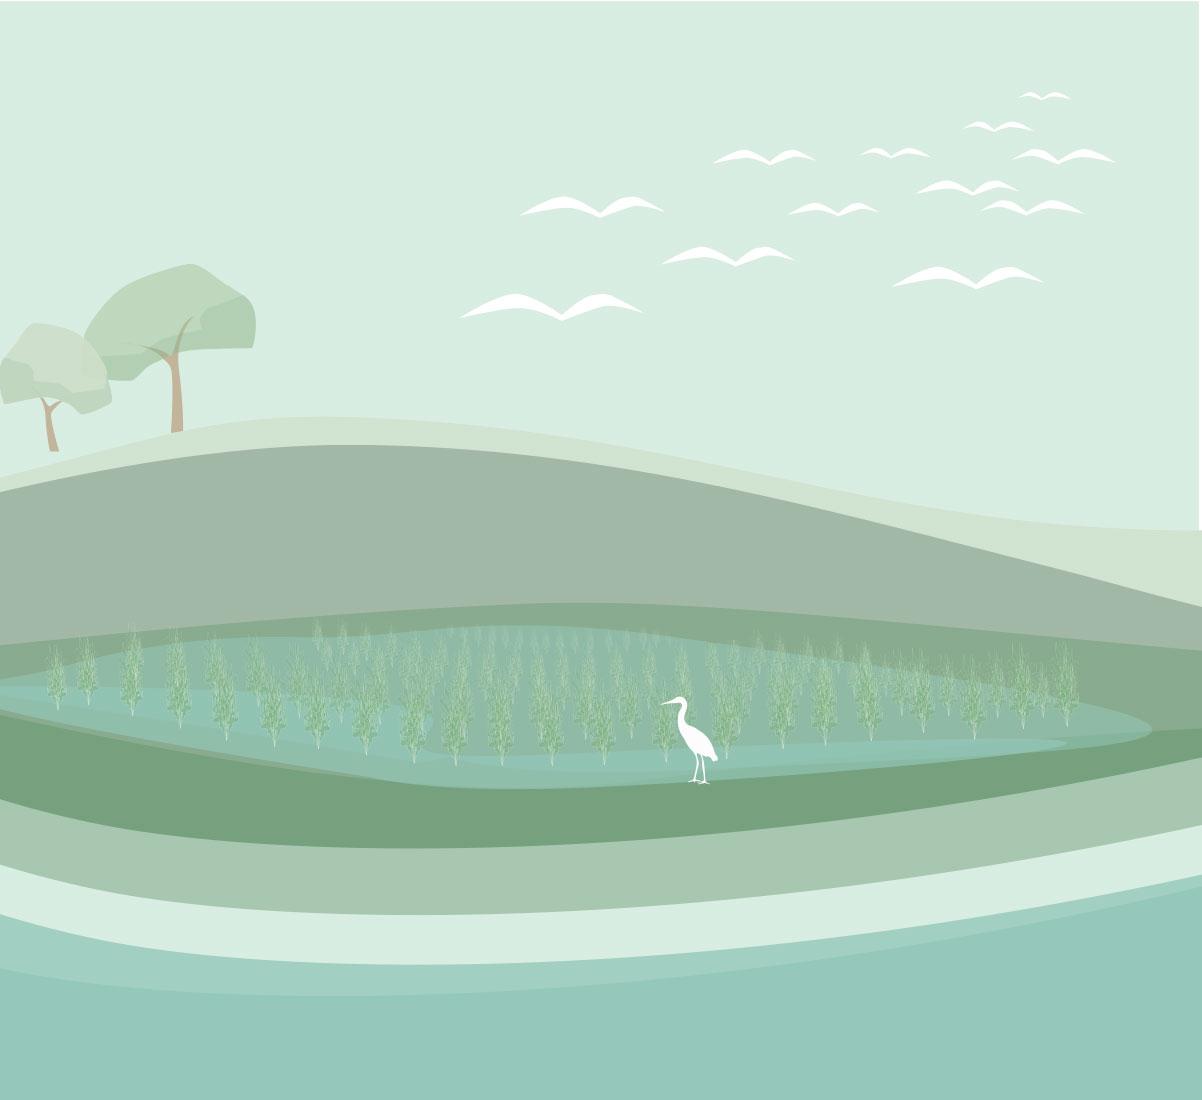 habitat + food production